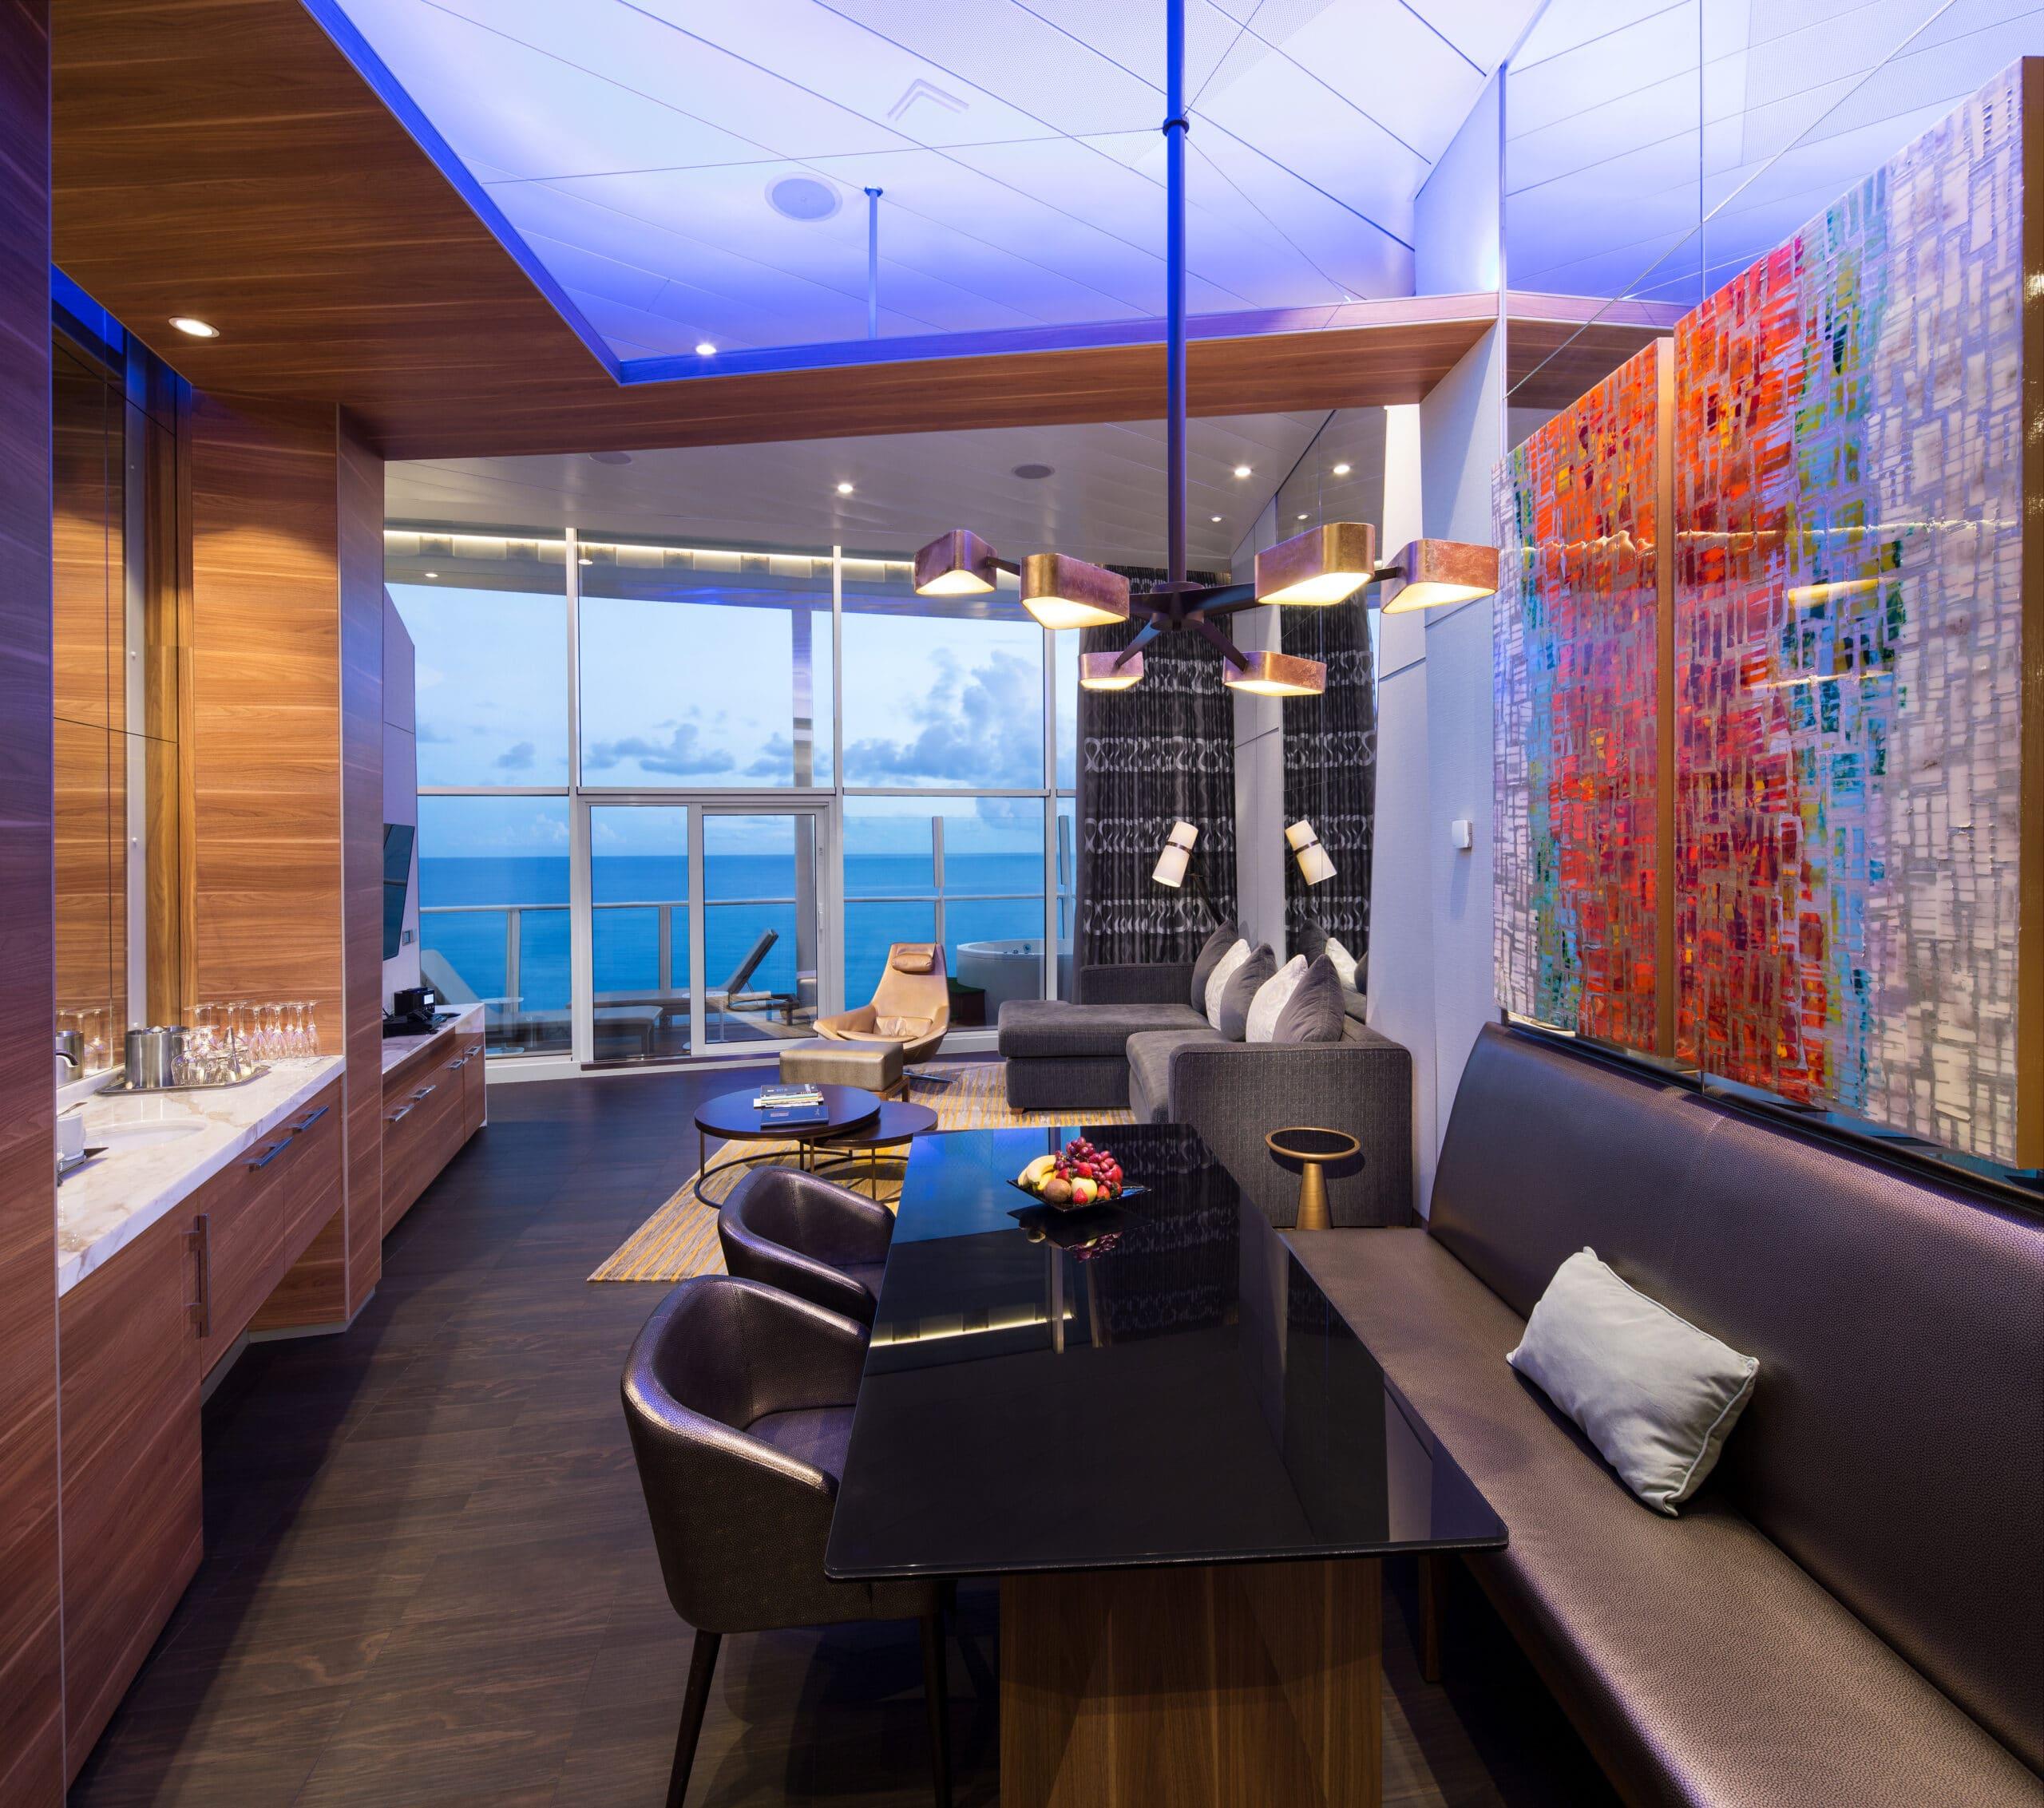 Royal-Caribbean-International-Allure-of-the-Seas-Oasis-of-the-seas-schip-cruiseschip-categorie-GP-Grand-Panoramic-Suite